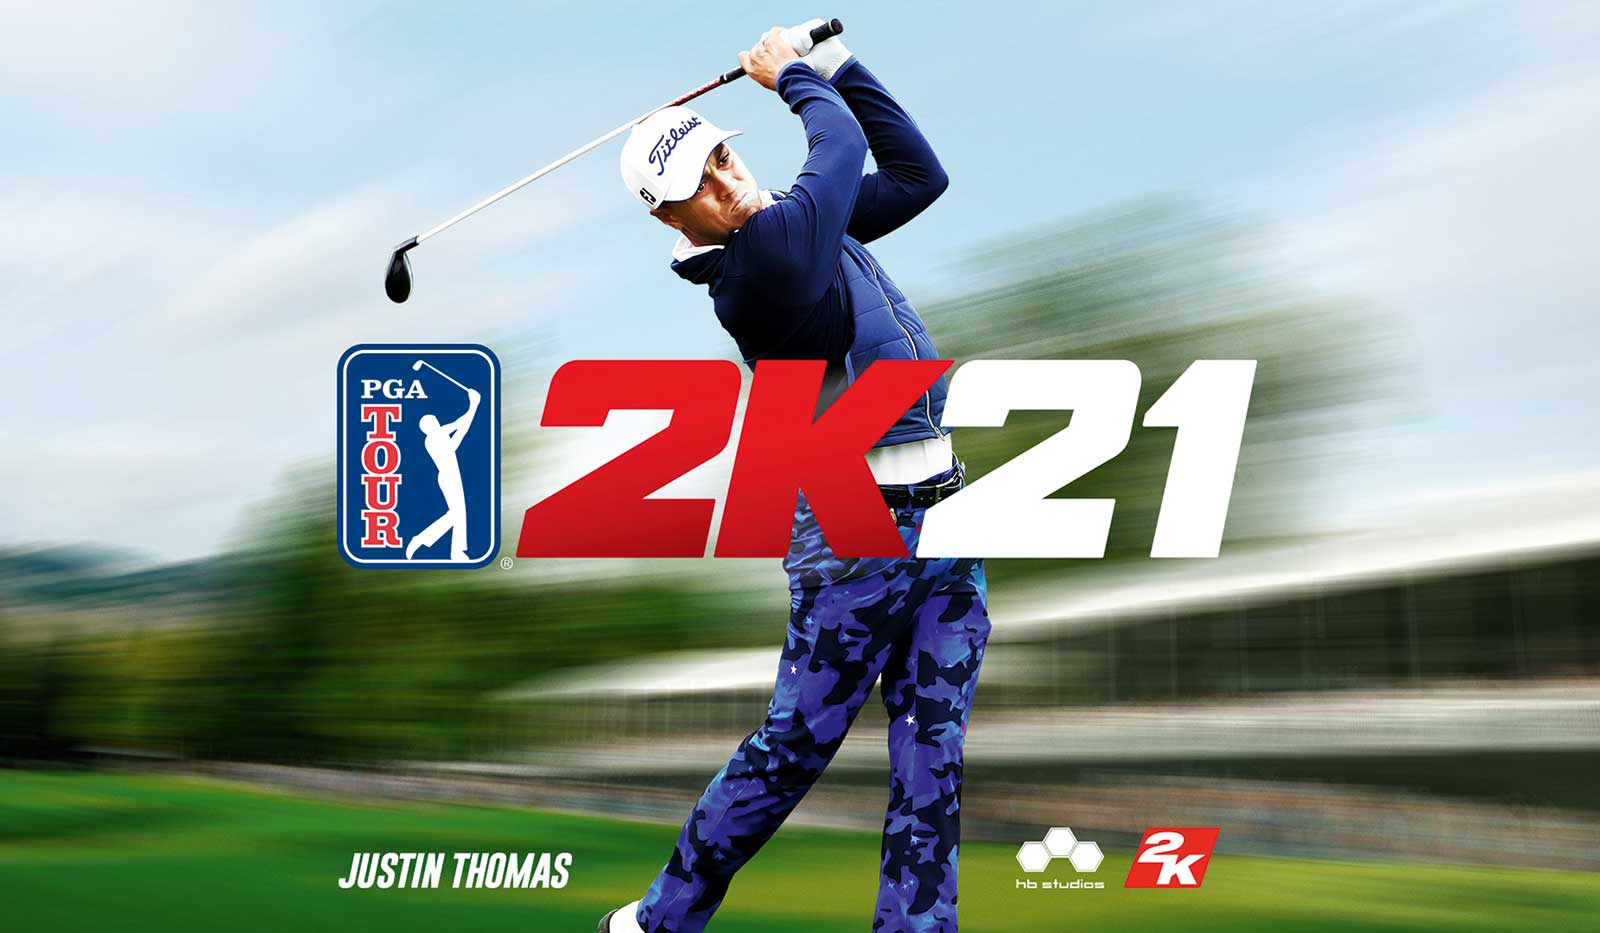 PGATour2k21 - PGA für Gamer – PGA Tour 2k21